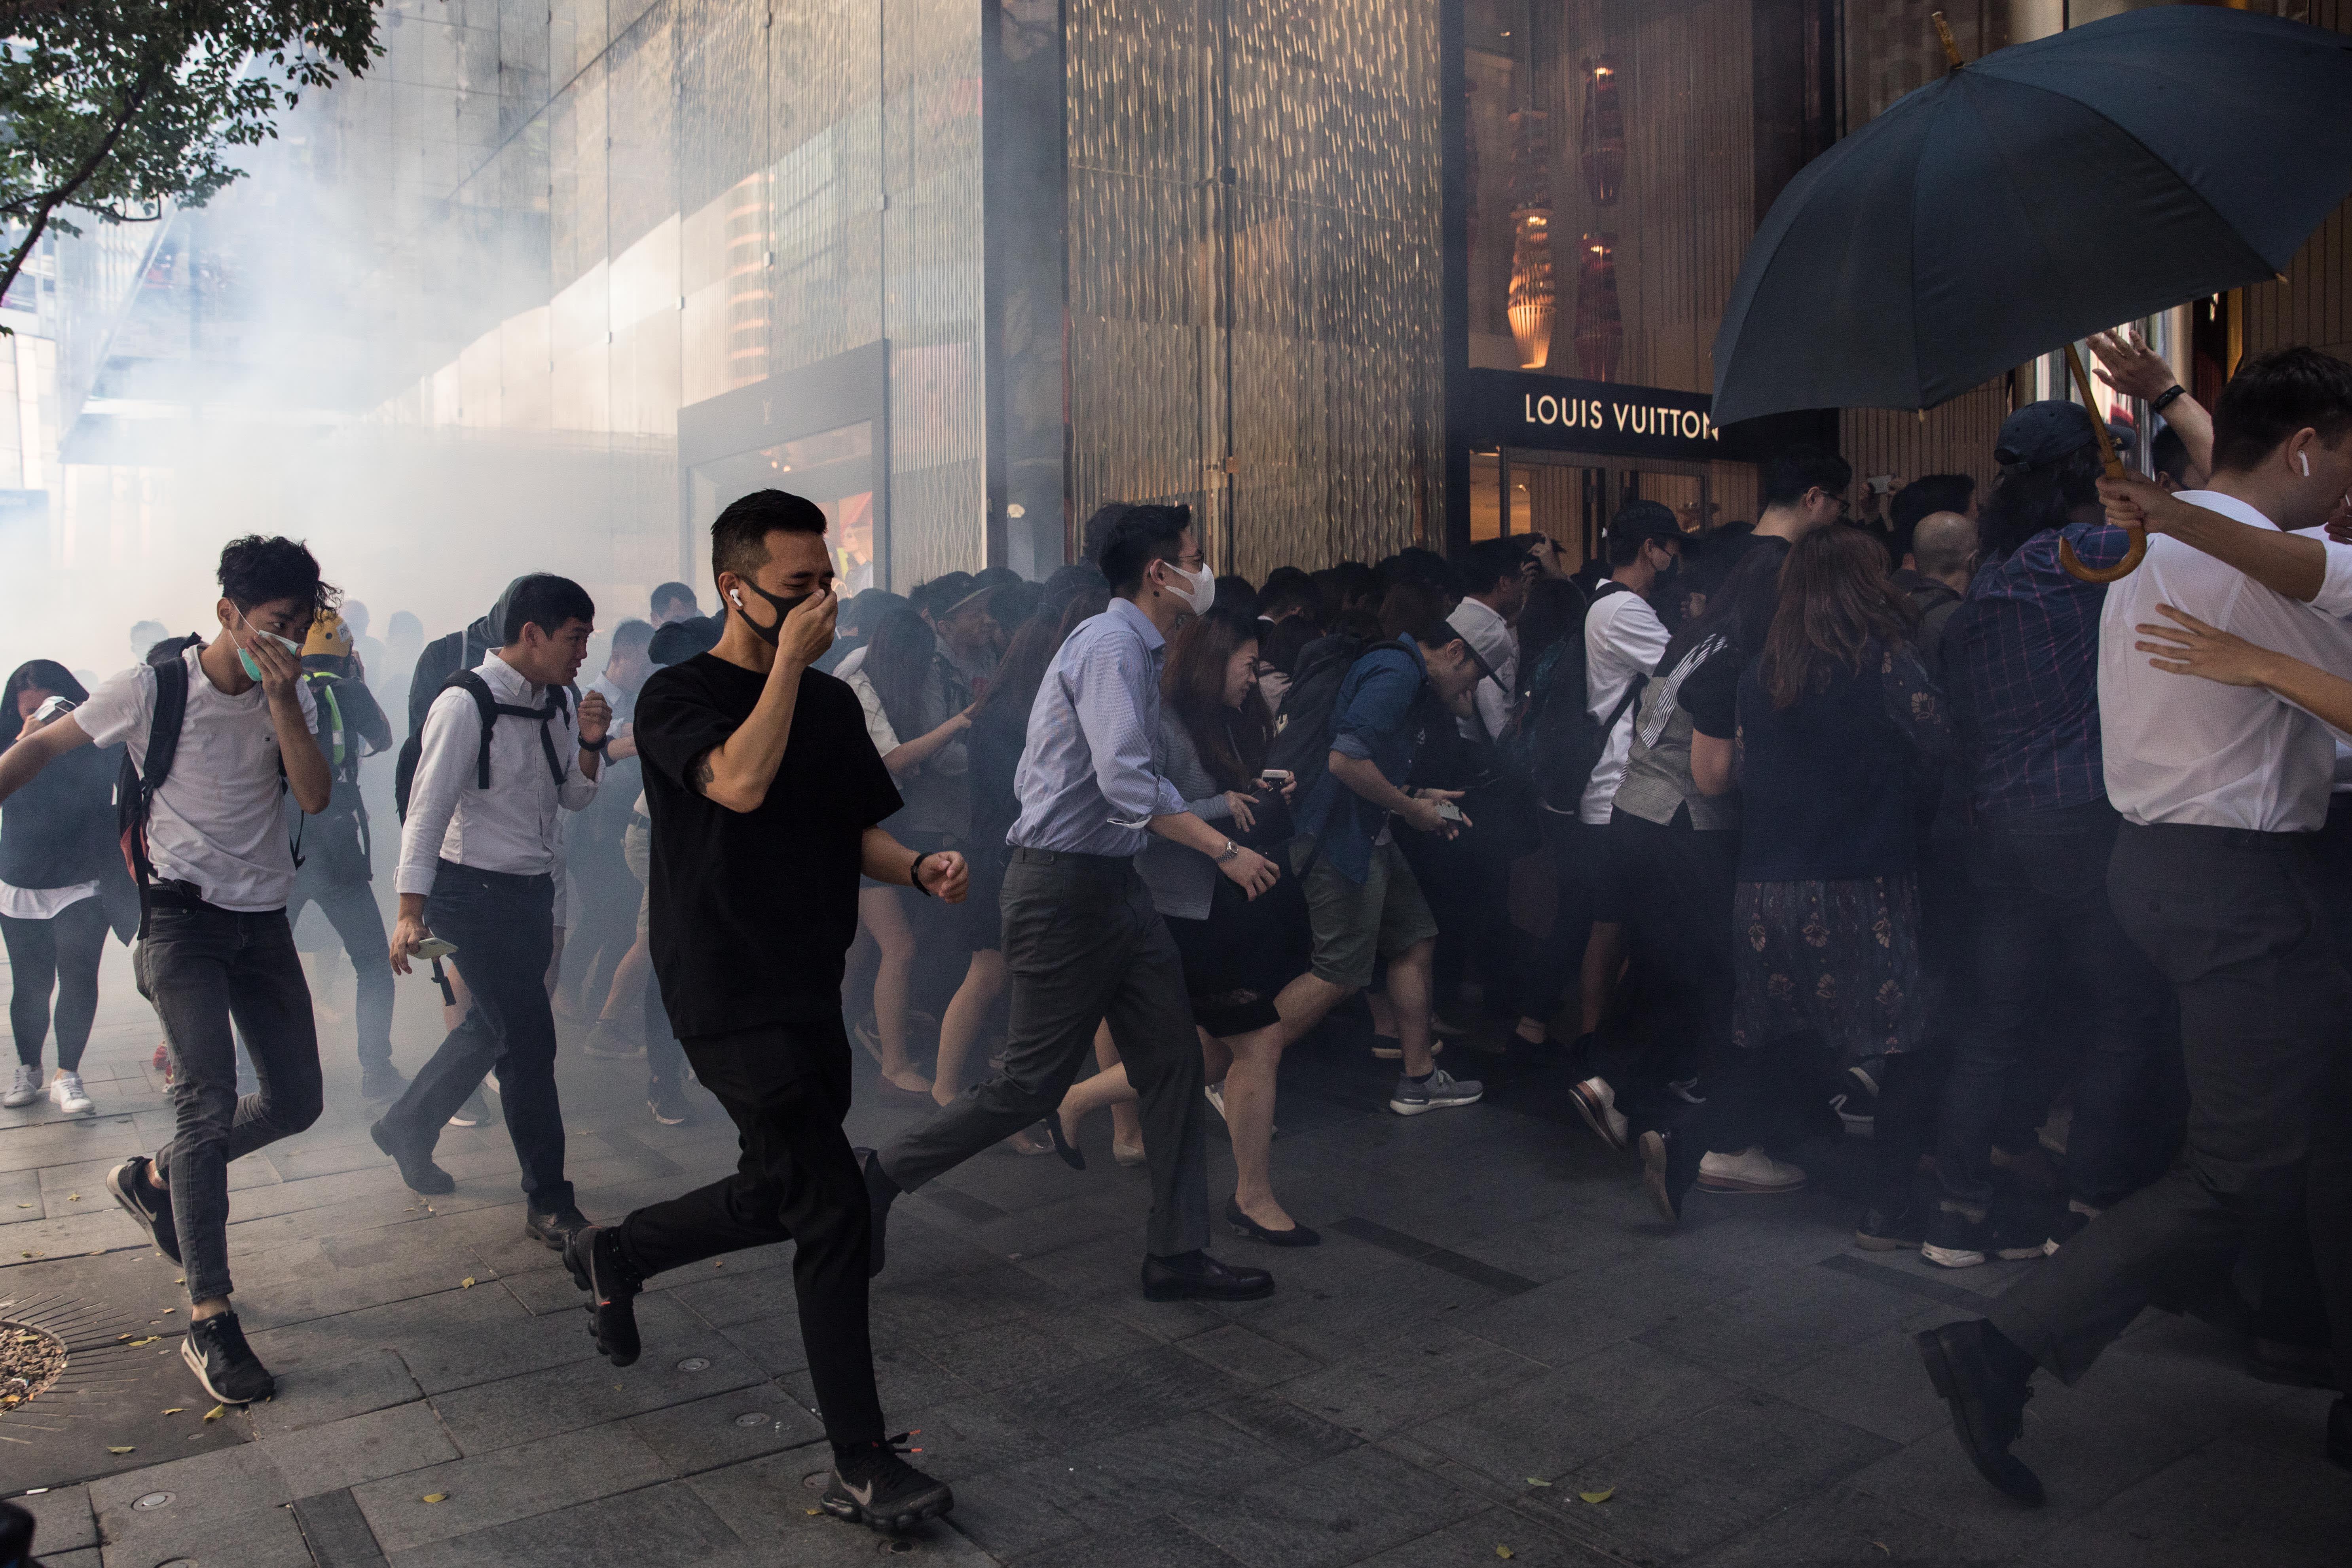 Hong Kong retail sales post worst slump on record as protests take toll